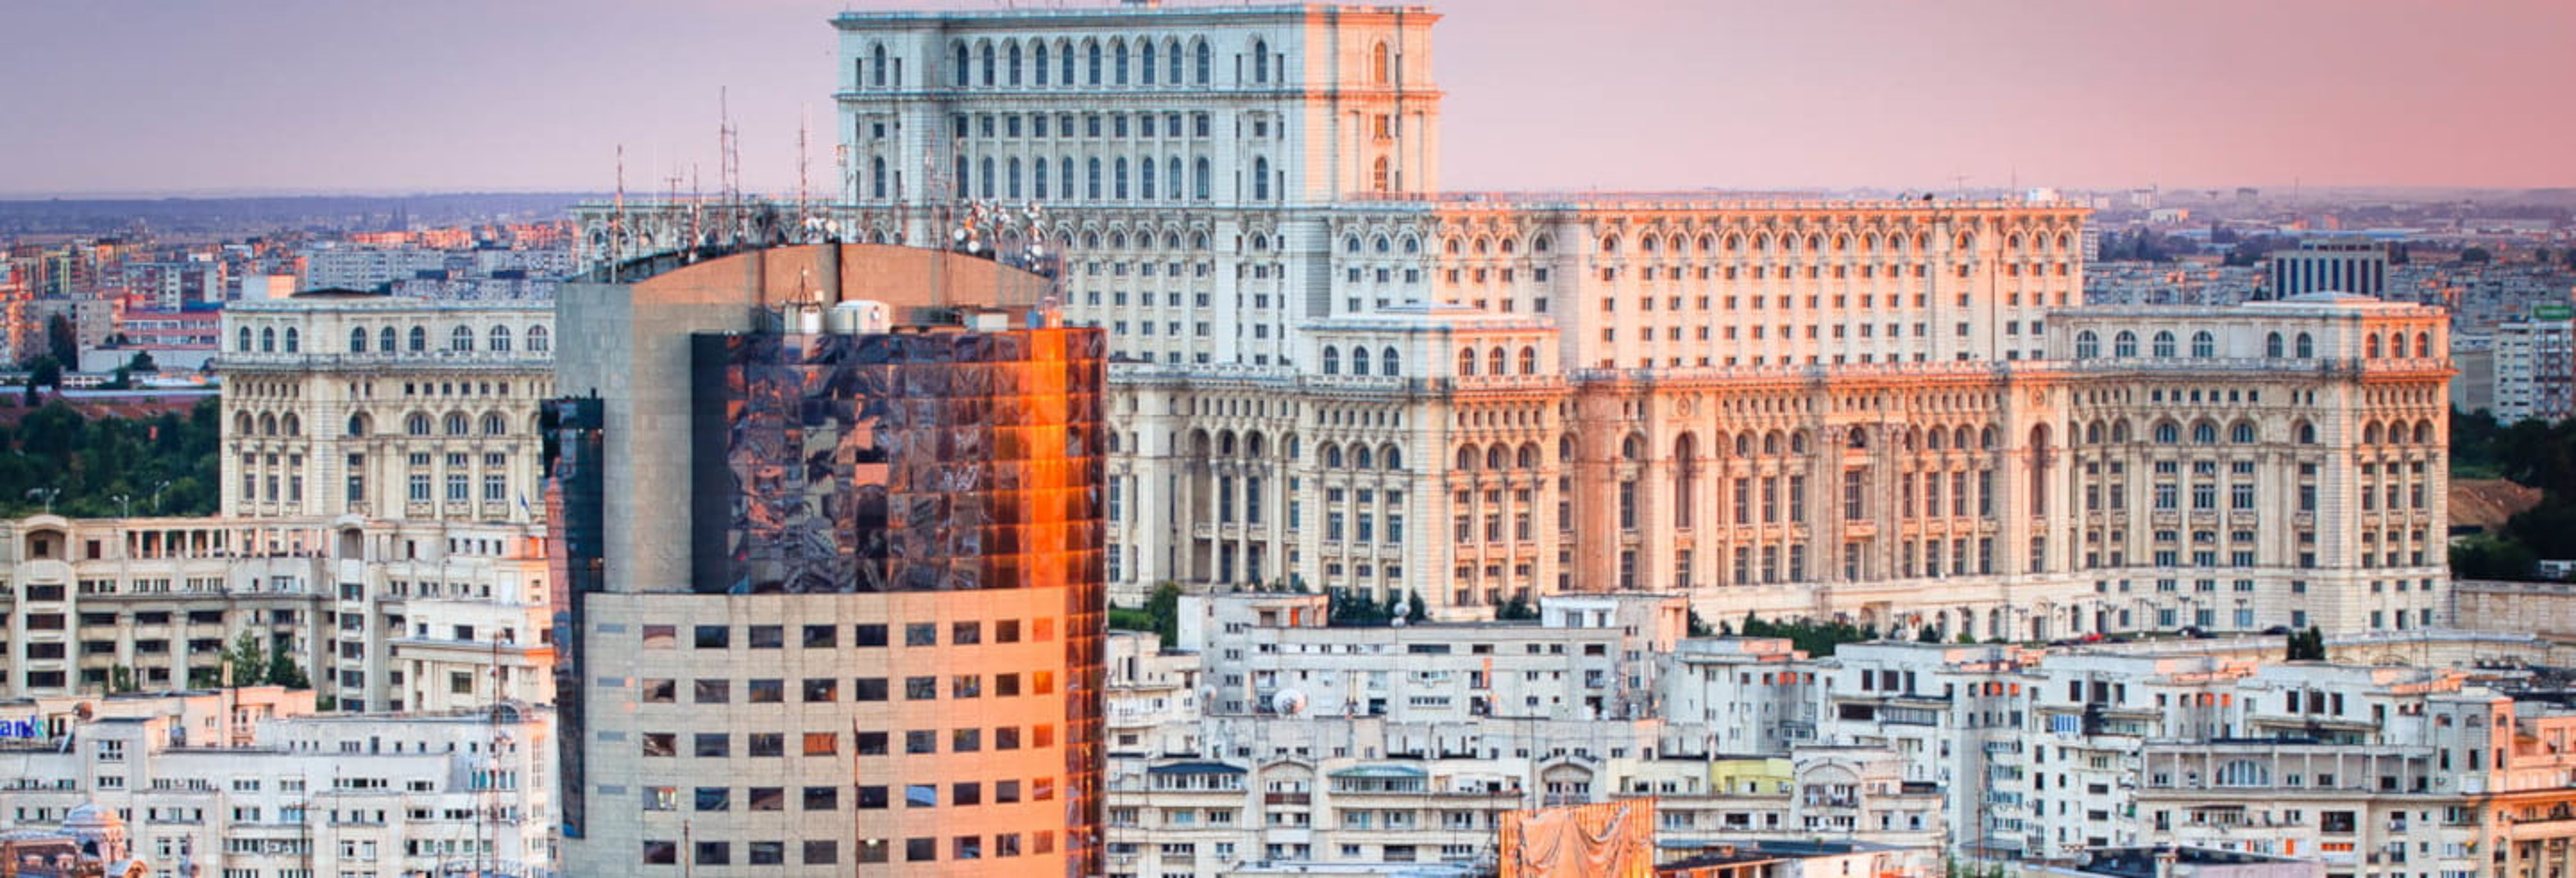 Tour por el Bucarest comunista